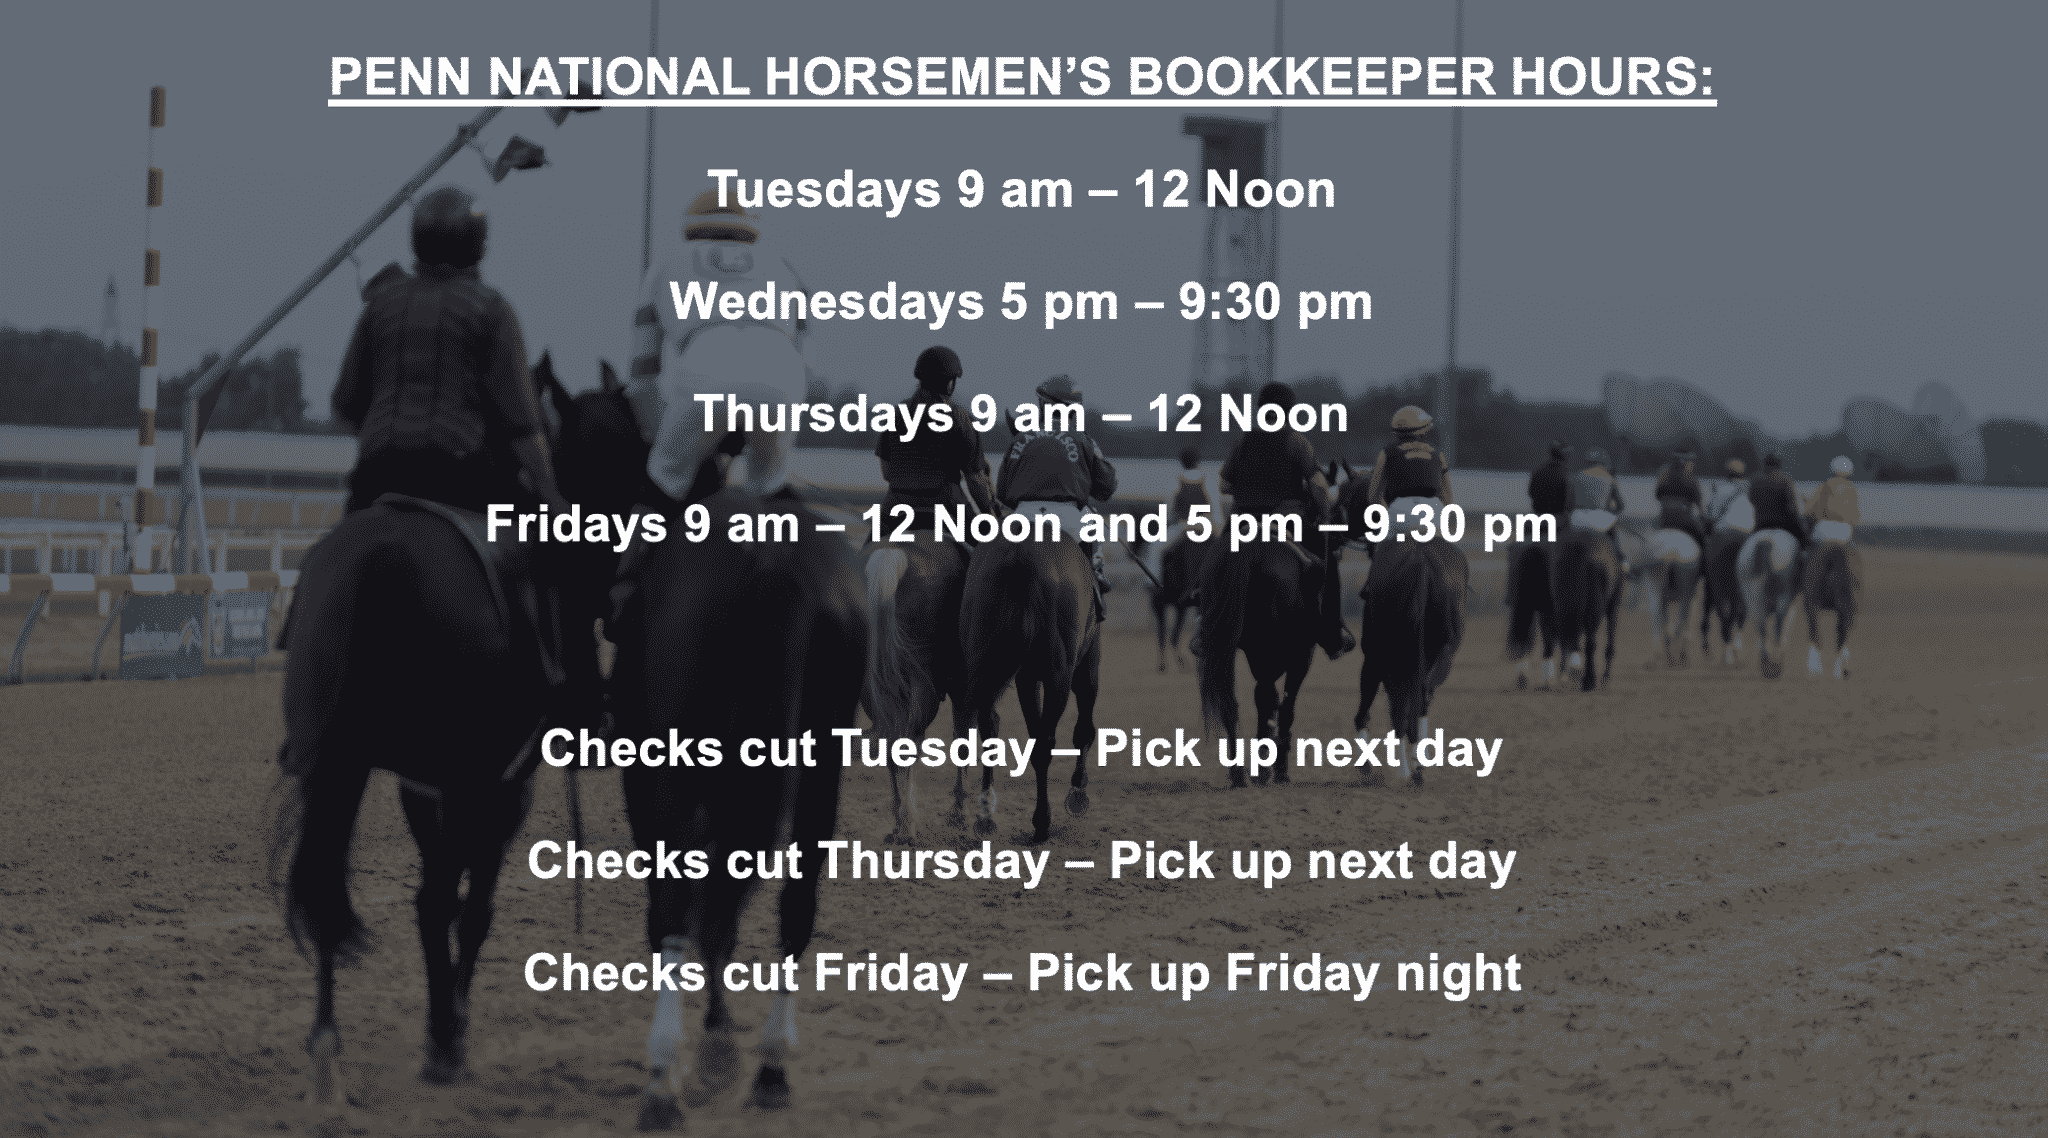 penn-national-horsemens-bookkeeper